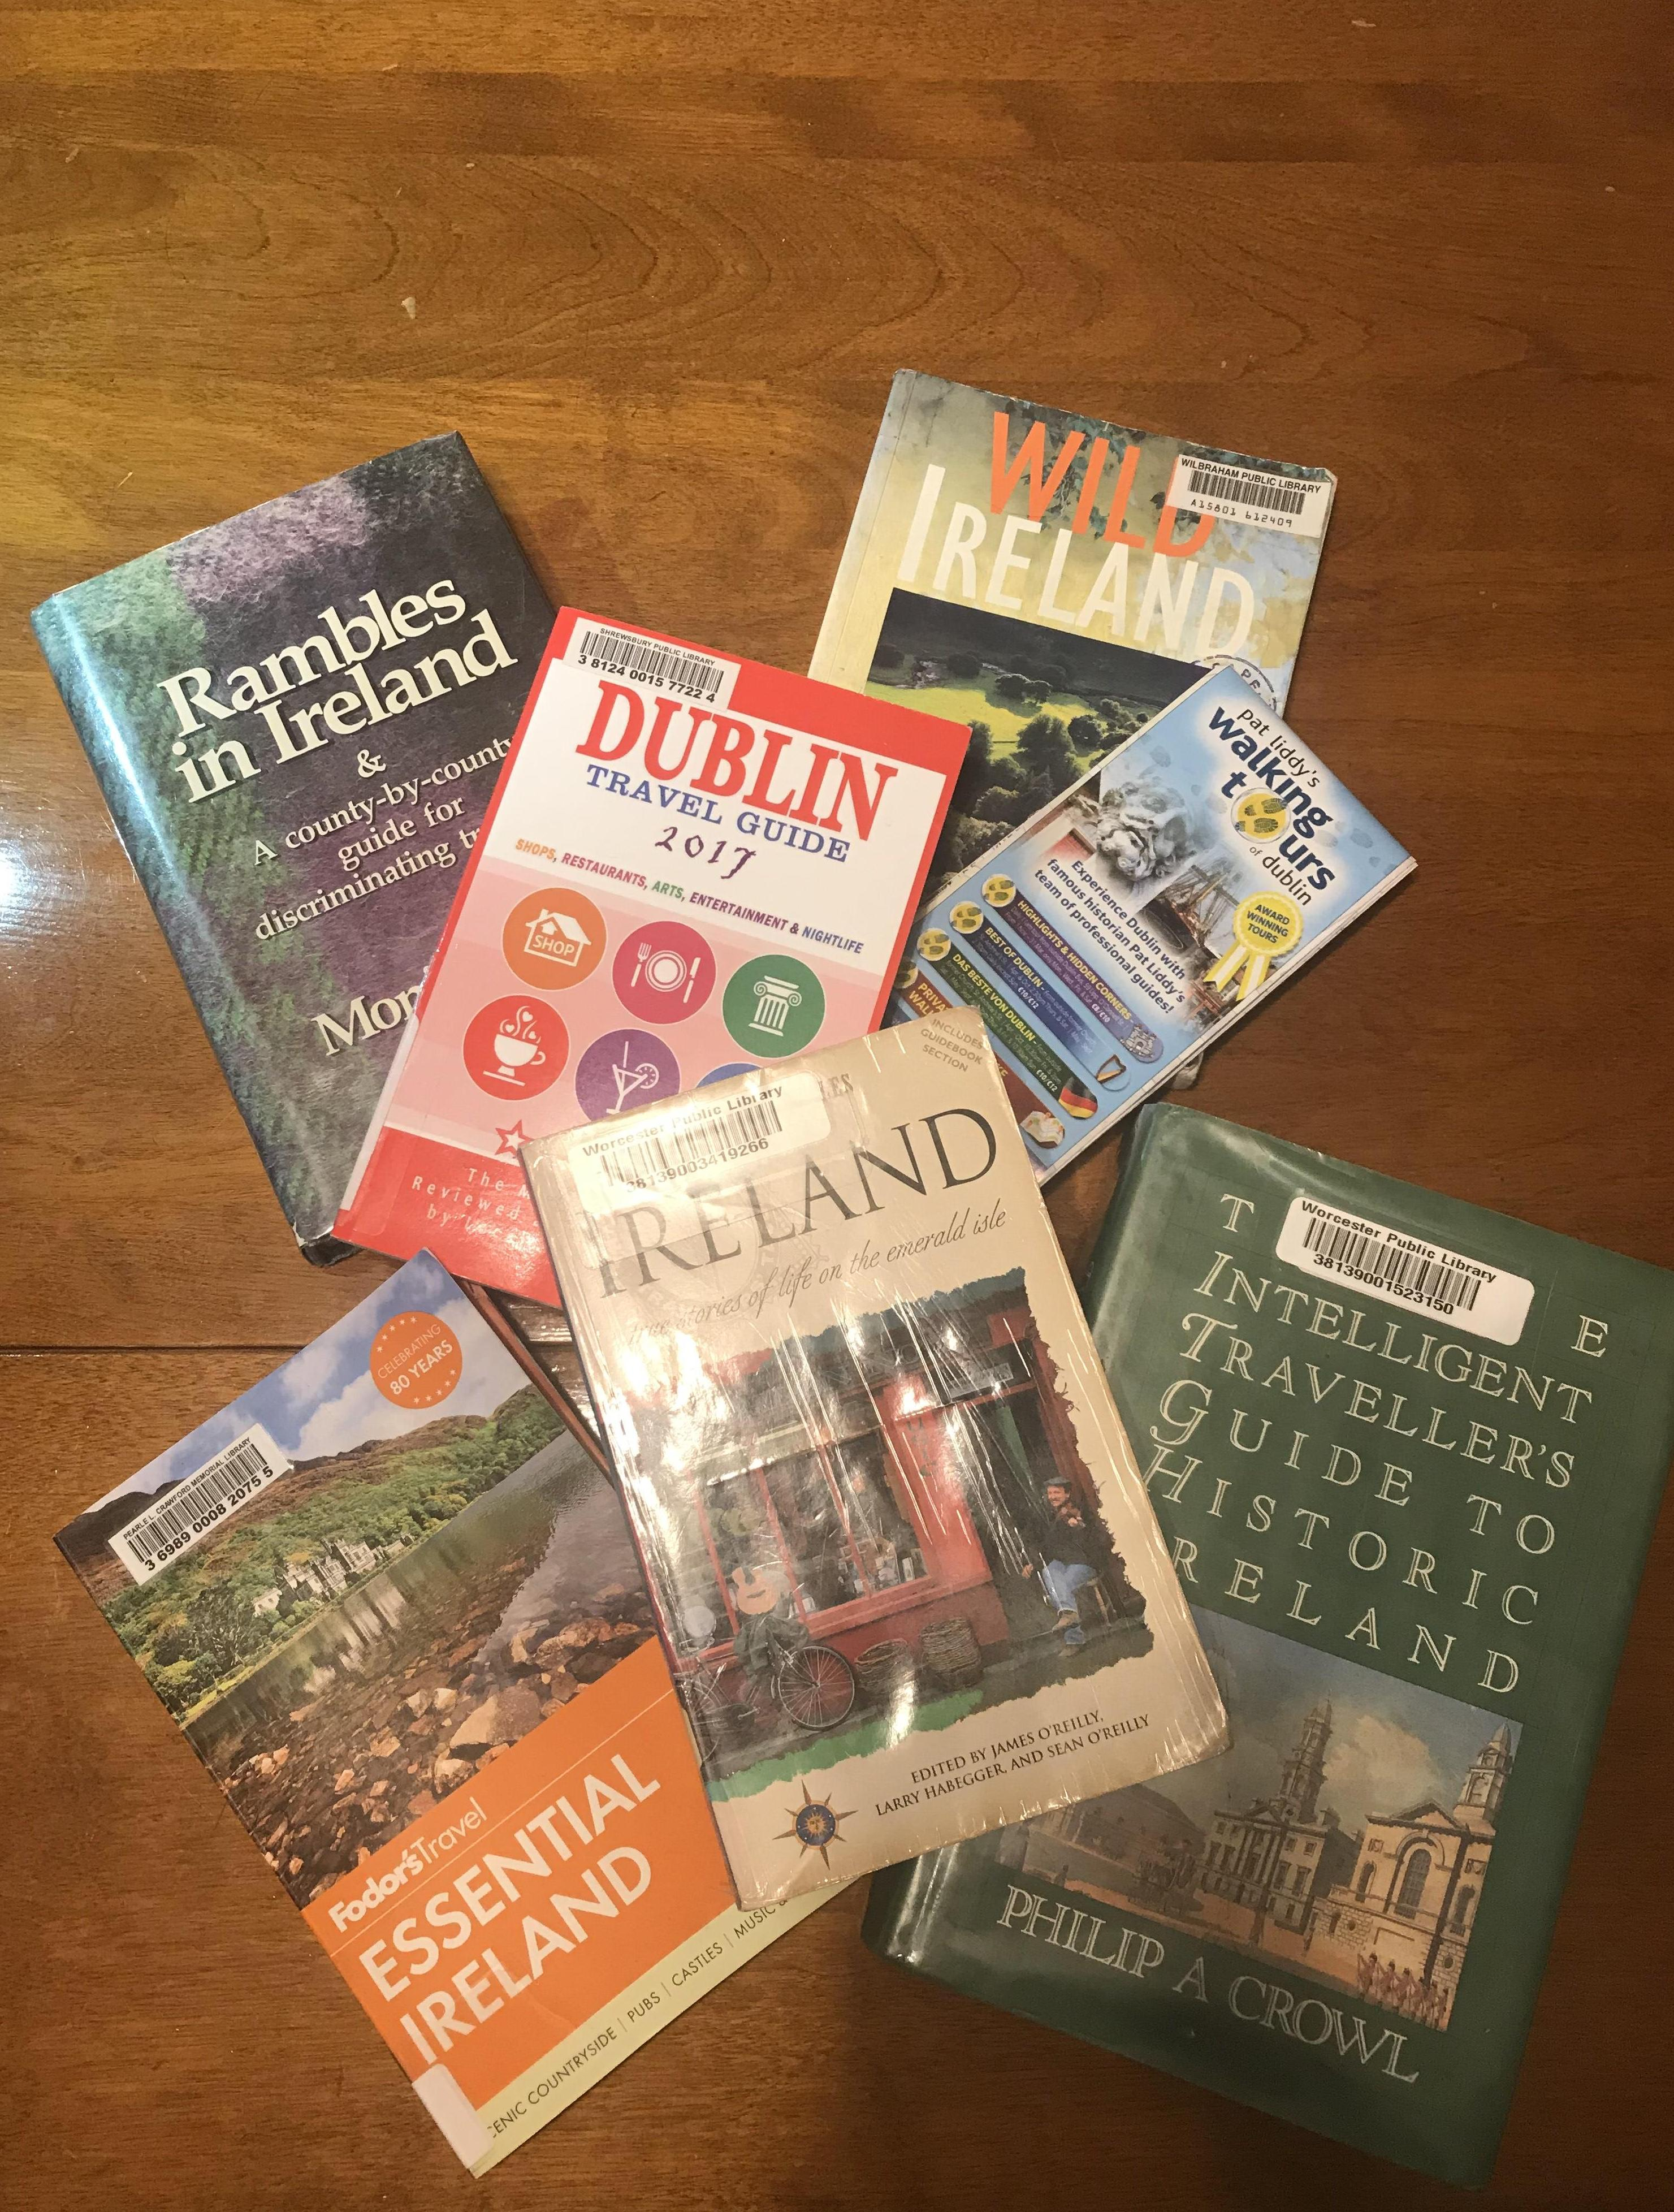 CAPAStudyAbroad_Dublin_Spring2018_From Brandon Mooney - Books about Dublin.jpeg